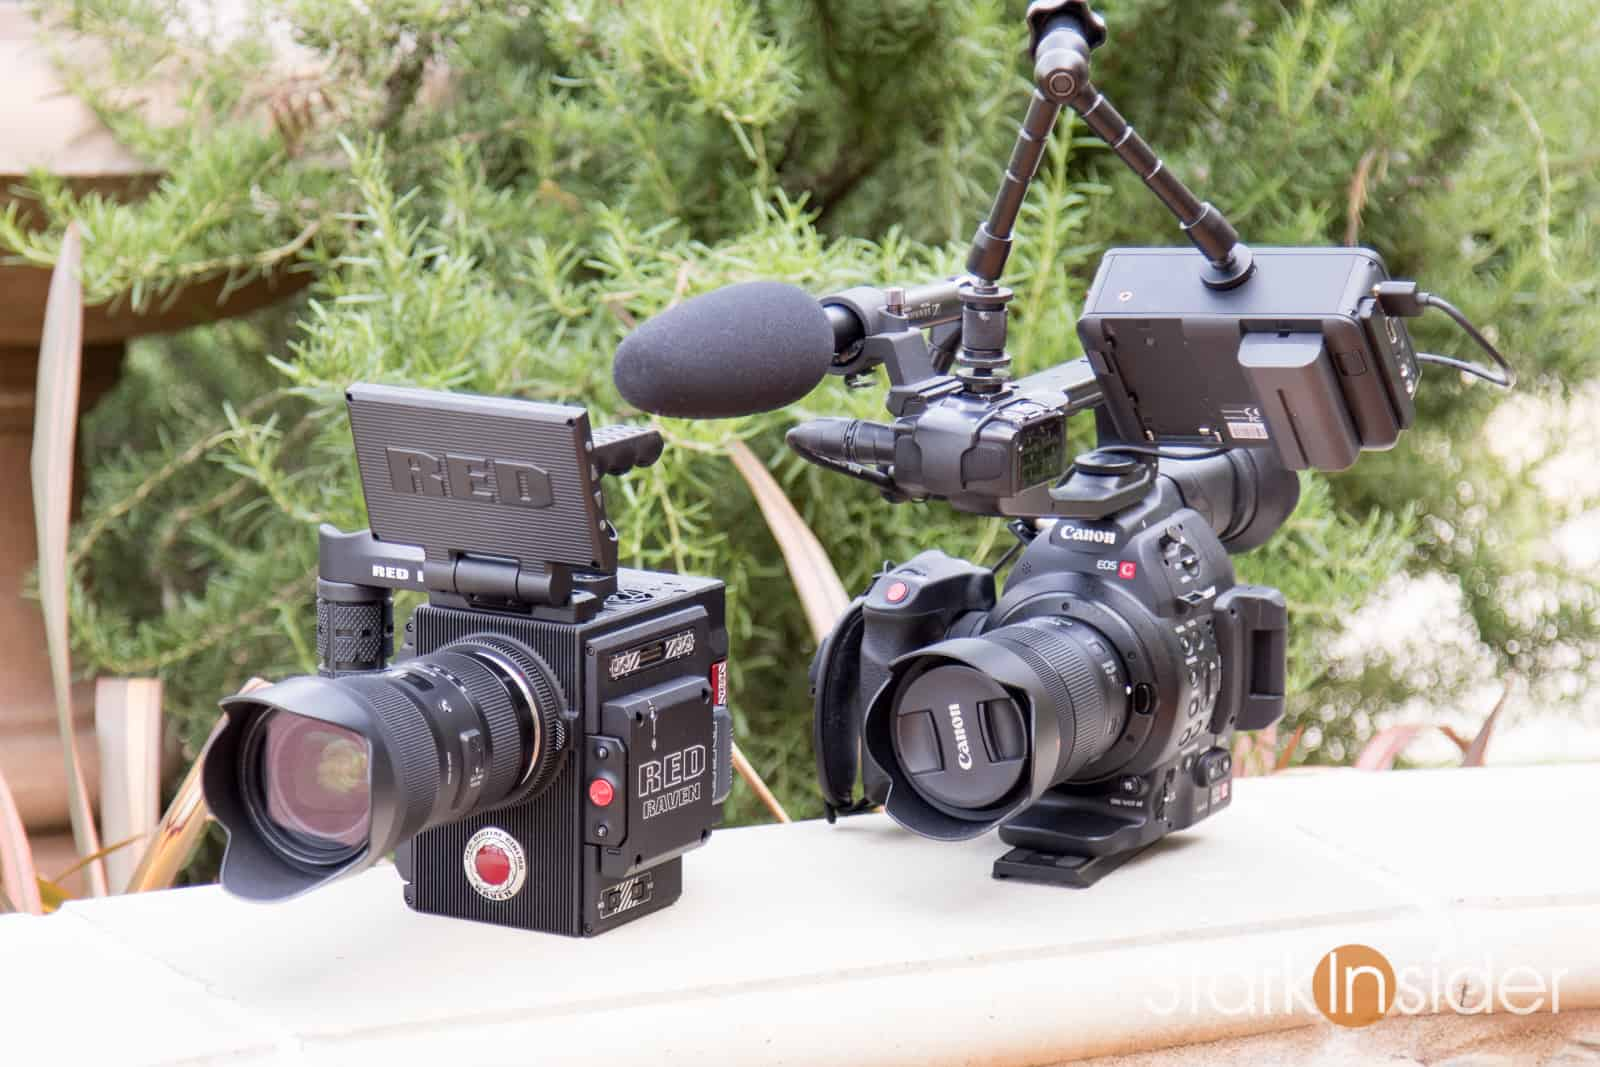 RED-Raven-Camera-Unboxing-Stark-Insider-8737